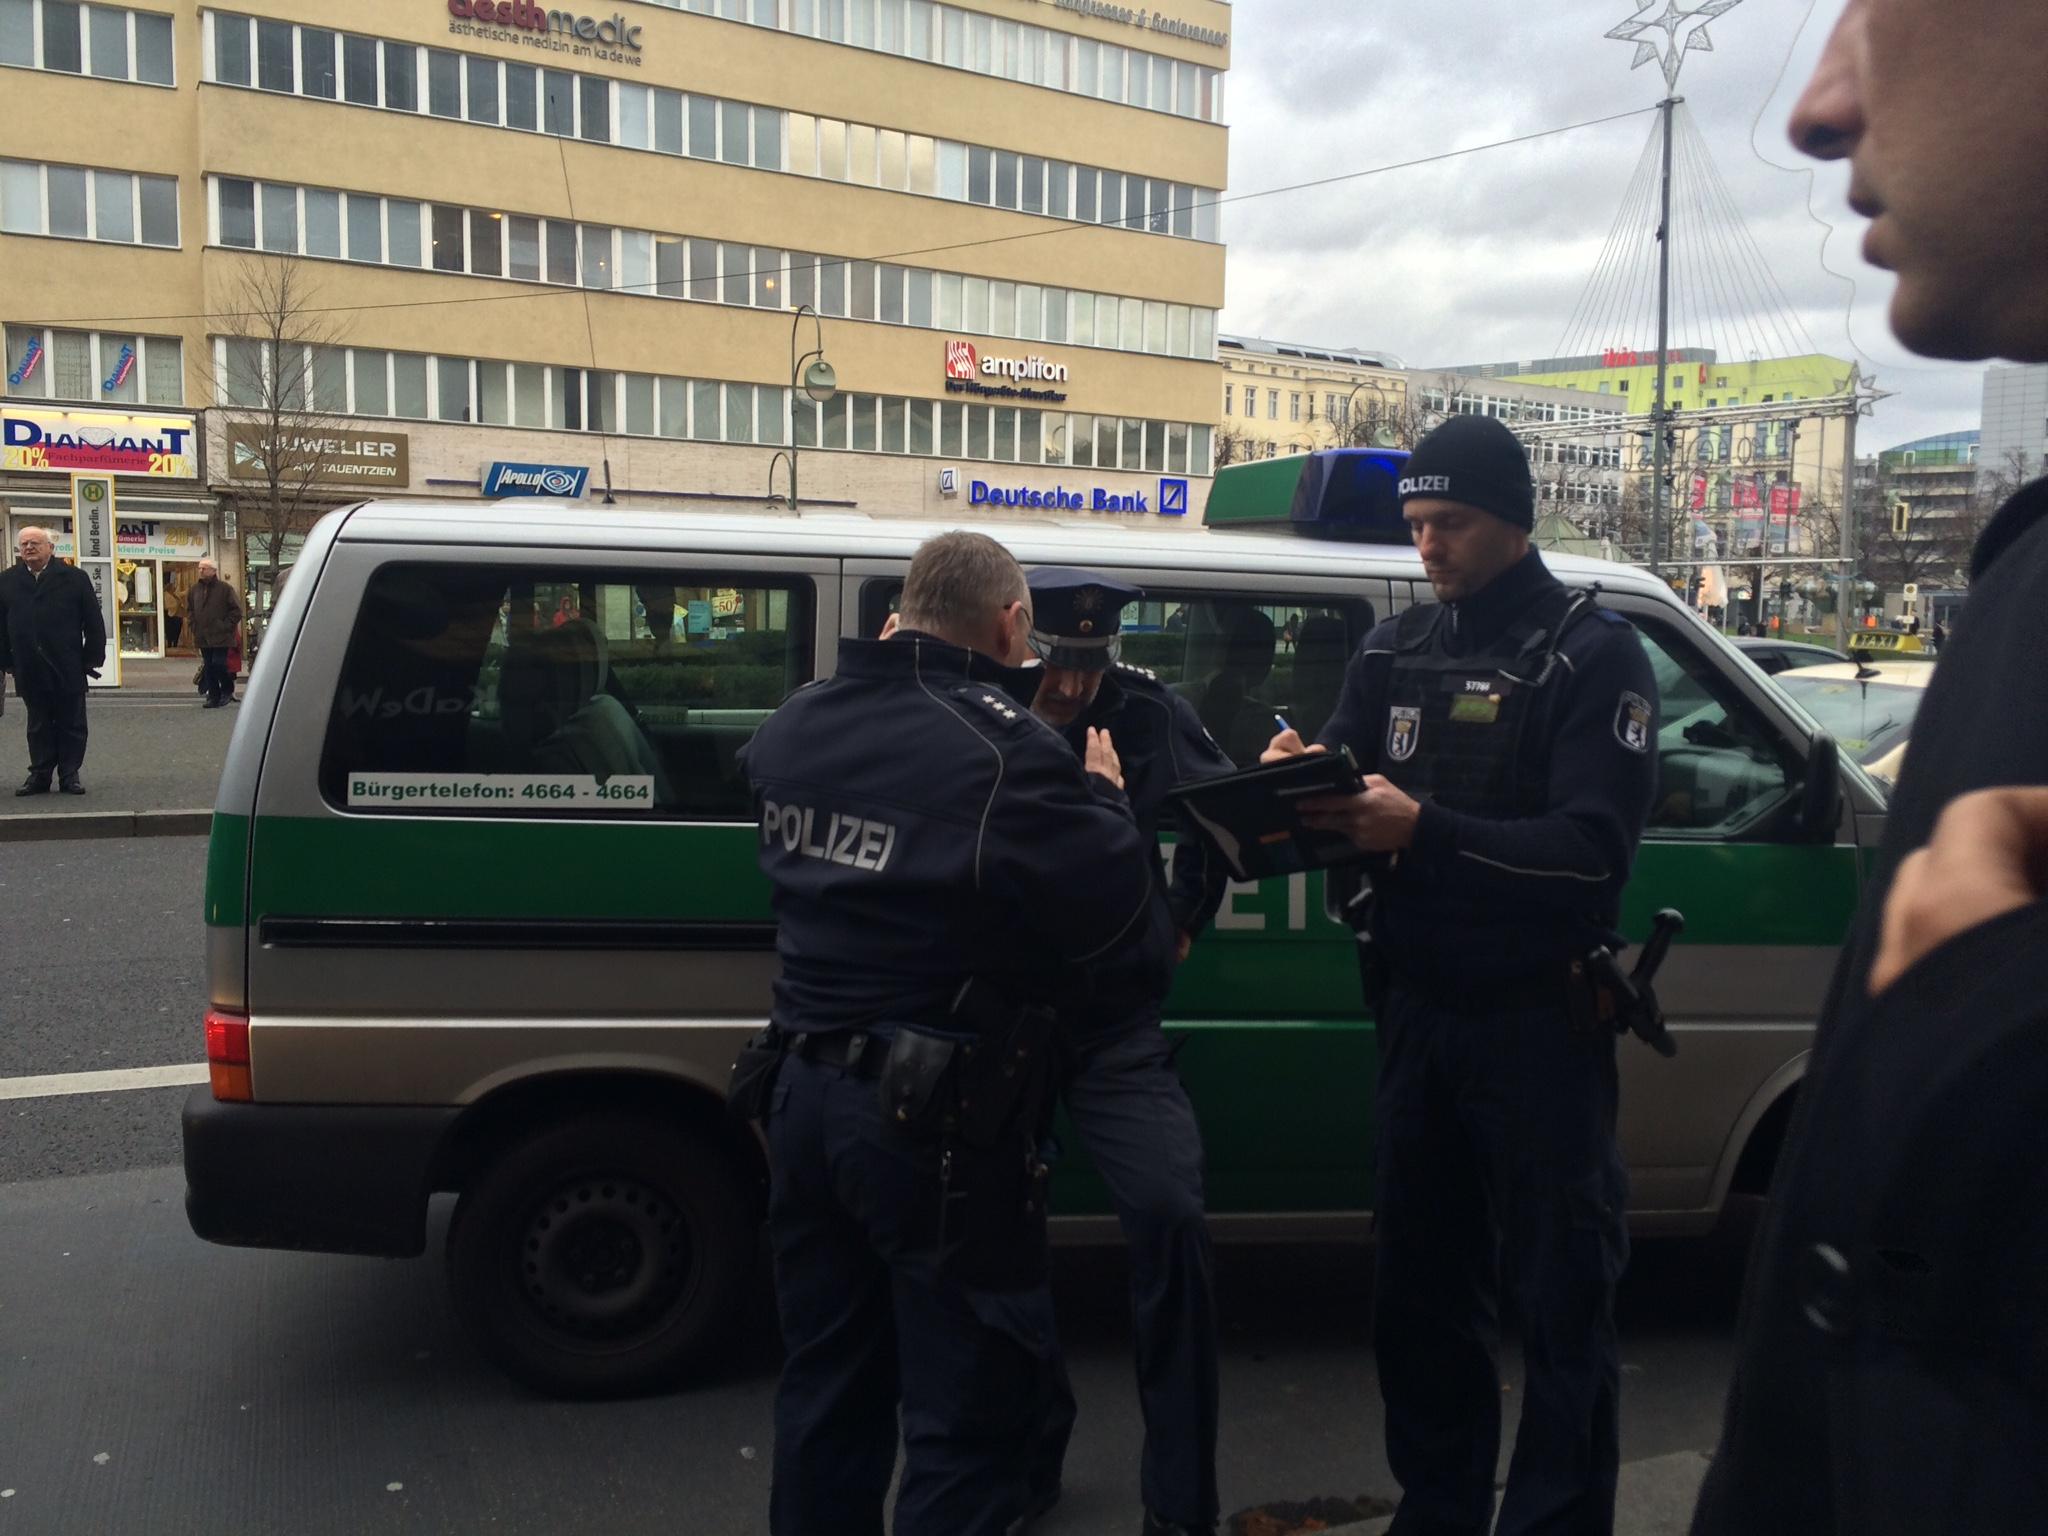 Germany Berlin Police